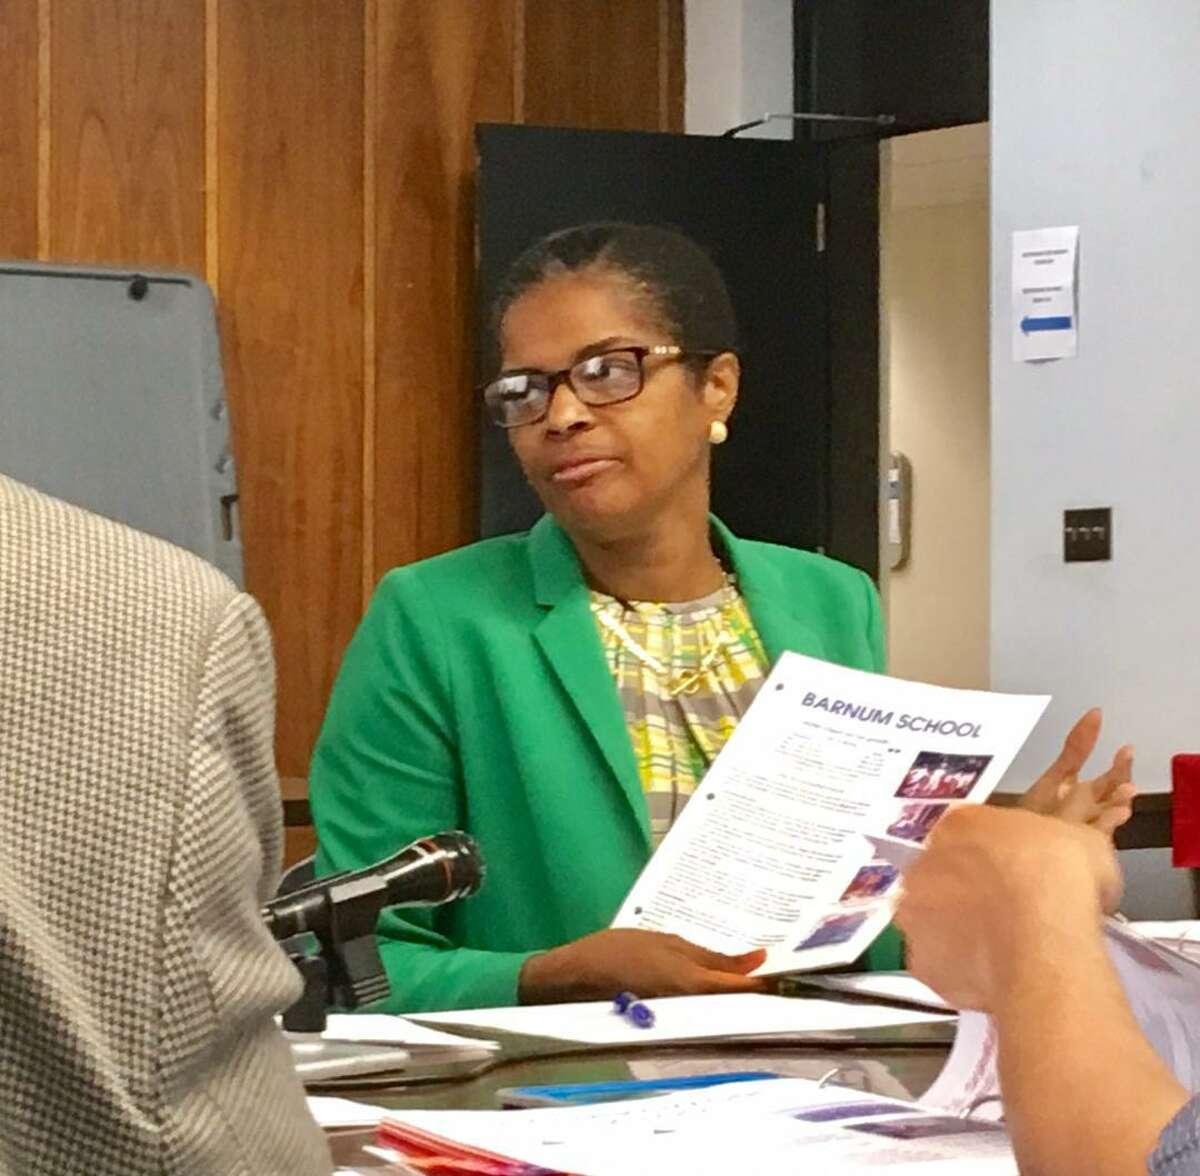 Bridgeport Schools Superintendent Aresta Johnson presenting to the board during her evaluation. June 2018.